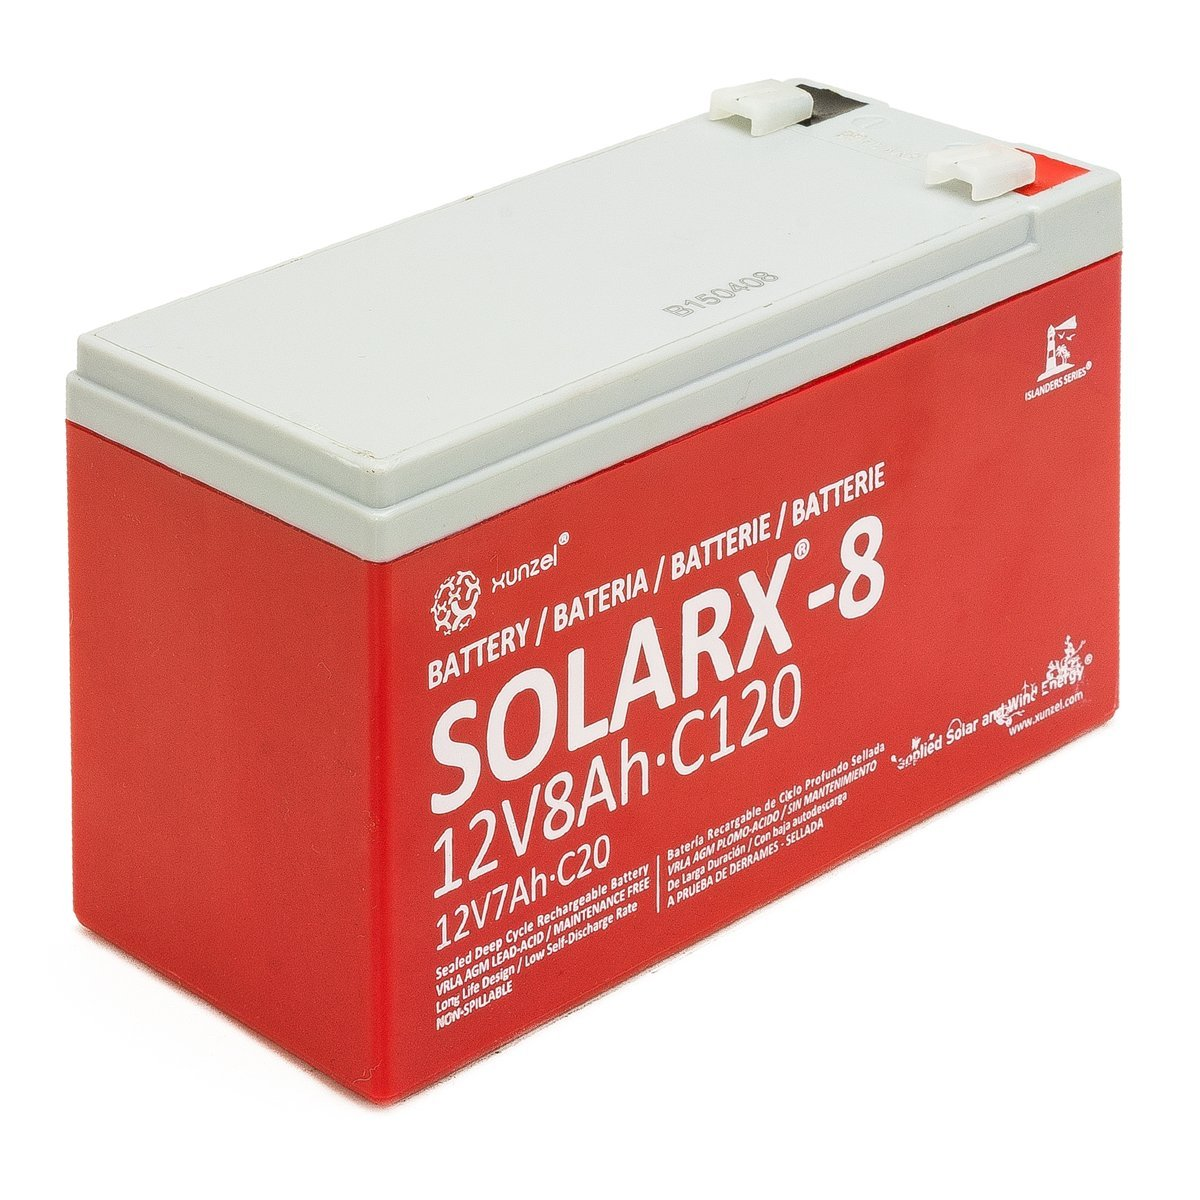 Xunzel Deep Cycle baterí a solar 12 V, 1 pieza, solarx de 8 1pieza SOLARX-8